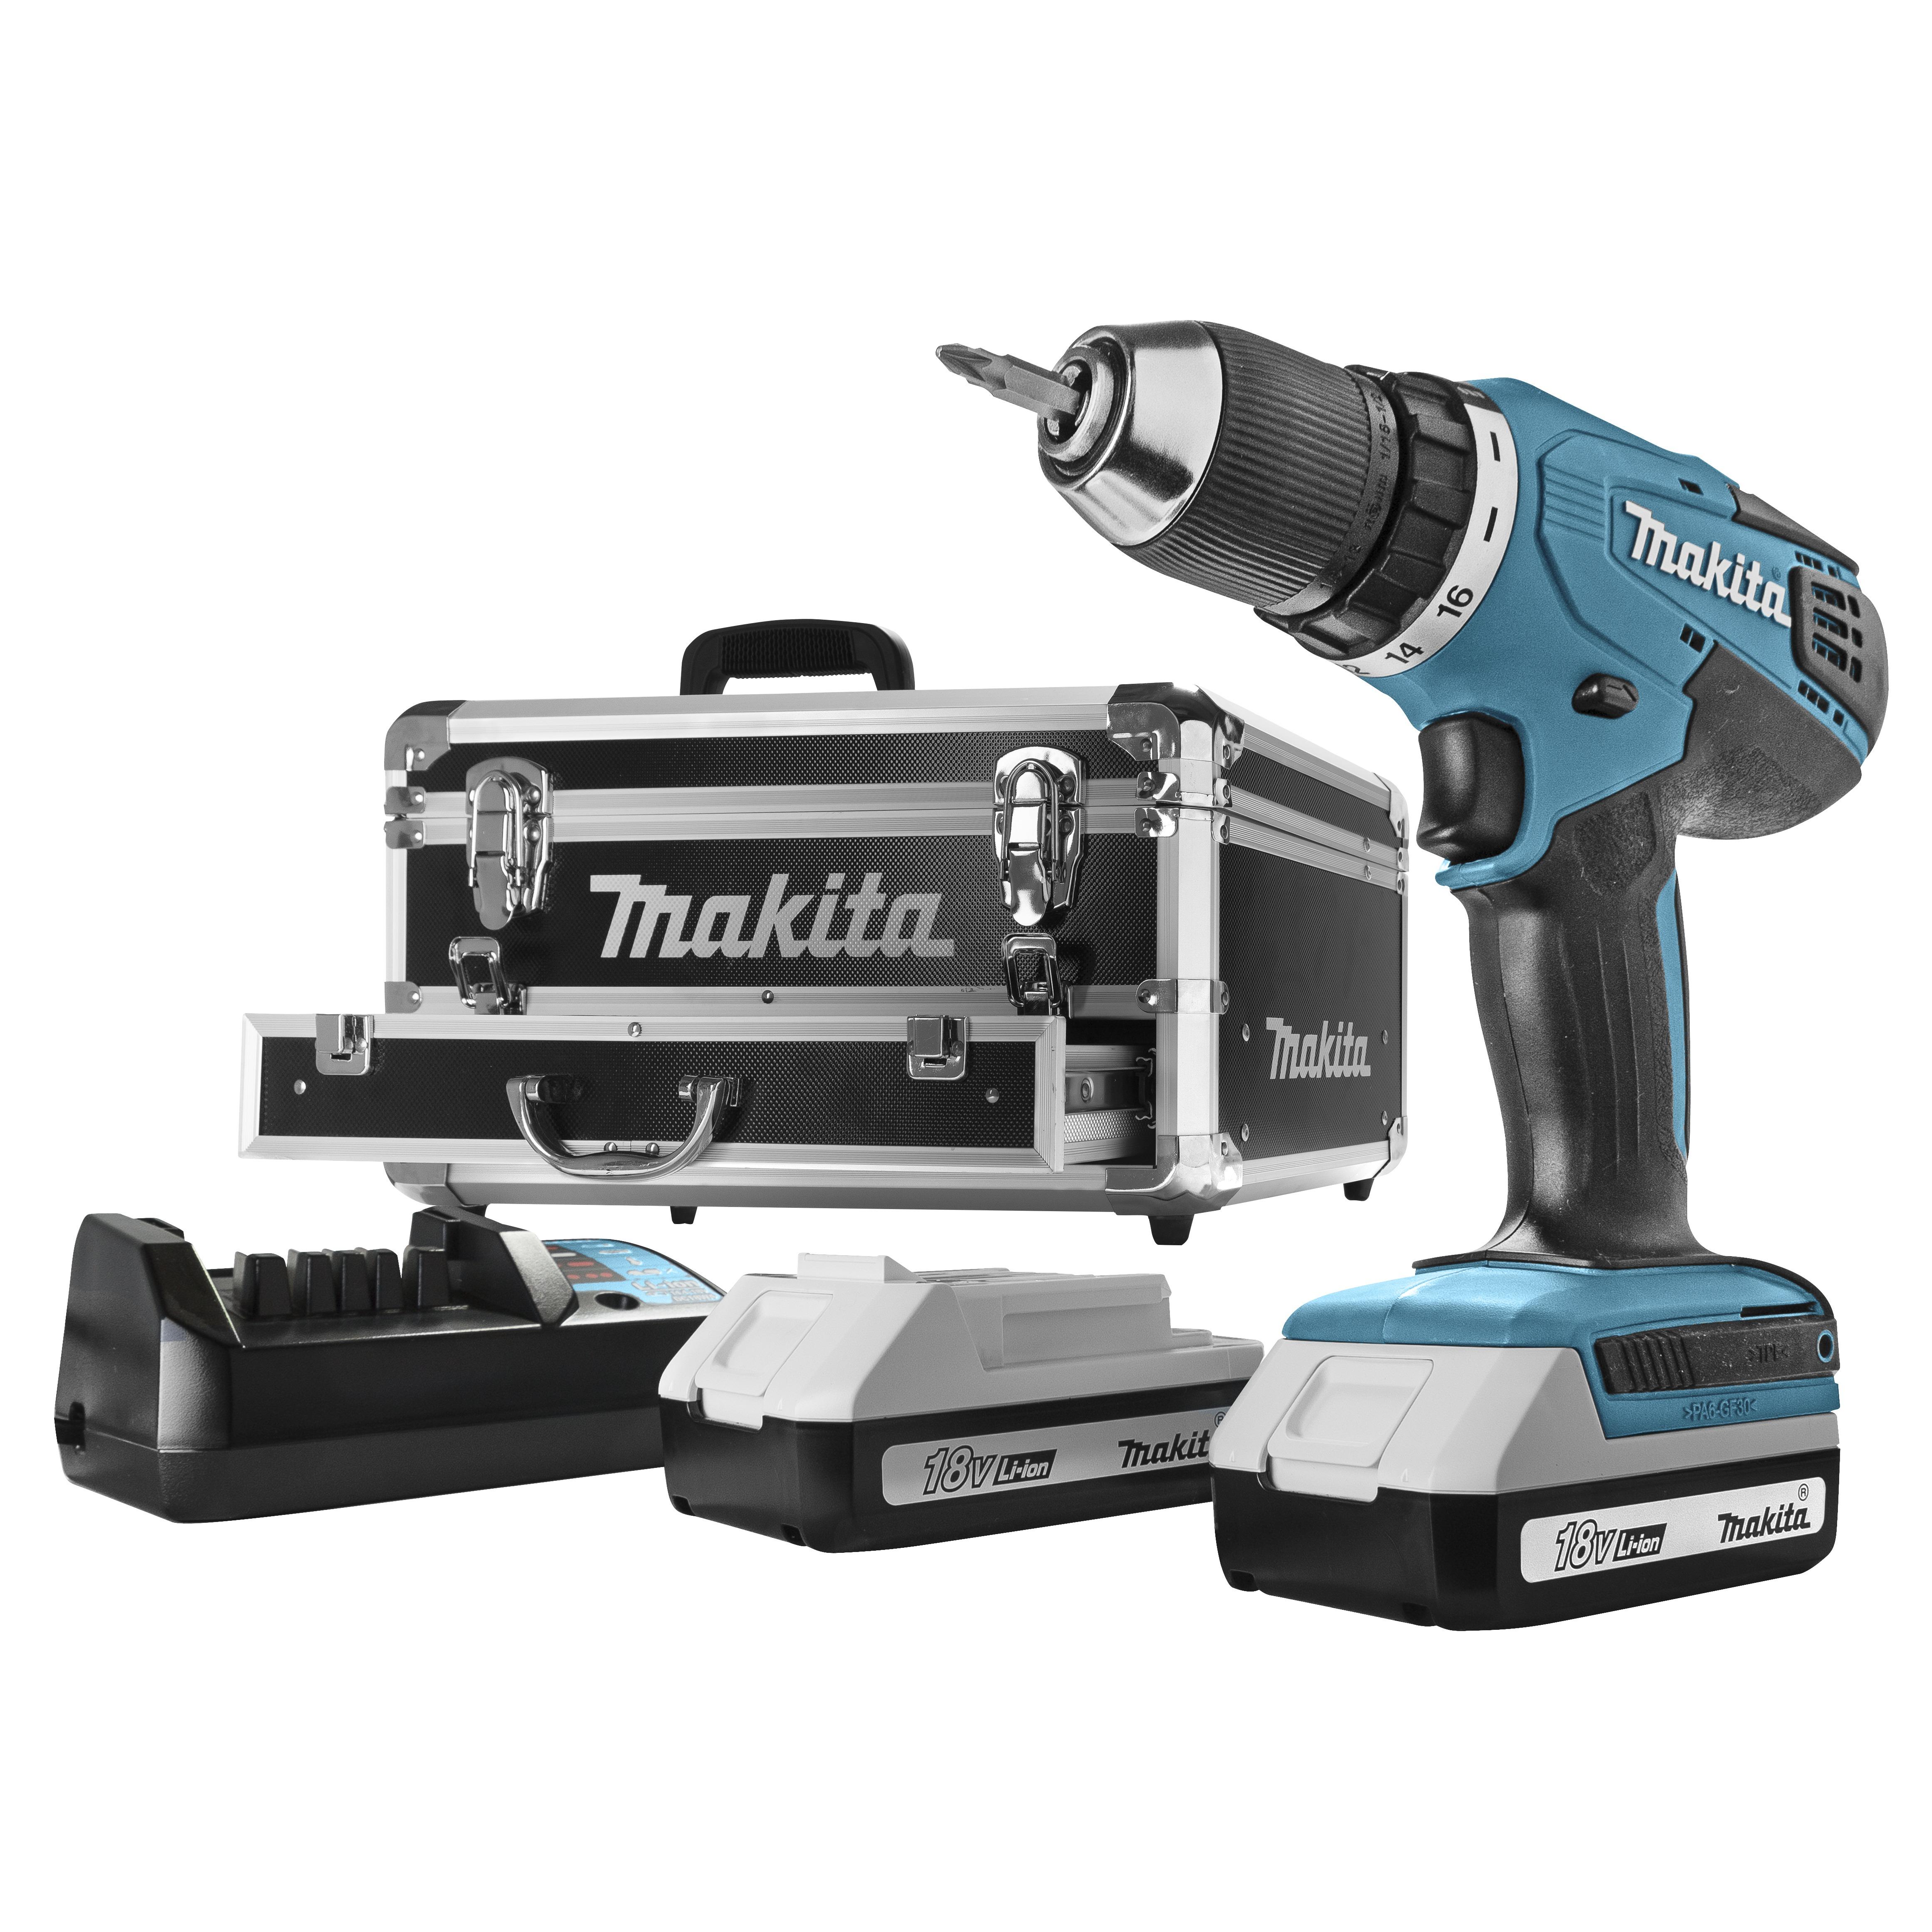 Makita accu boormachine DF457DWEX2 + 70-delige accessoireset